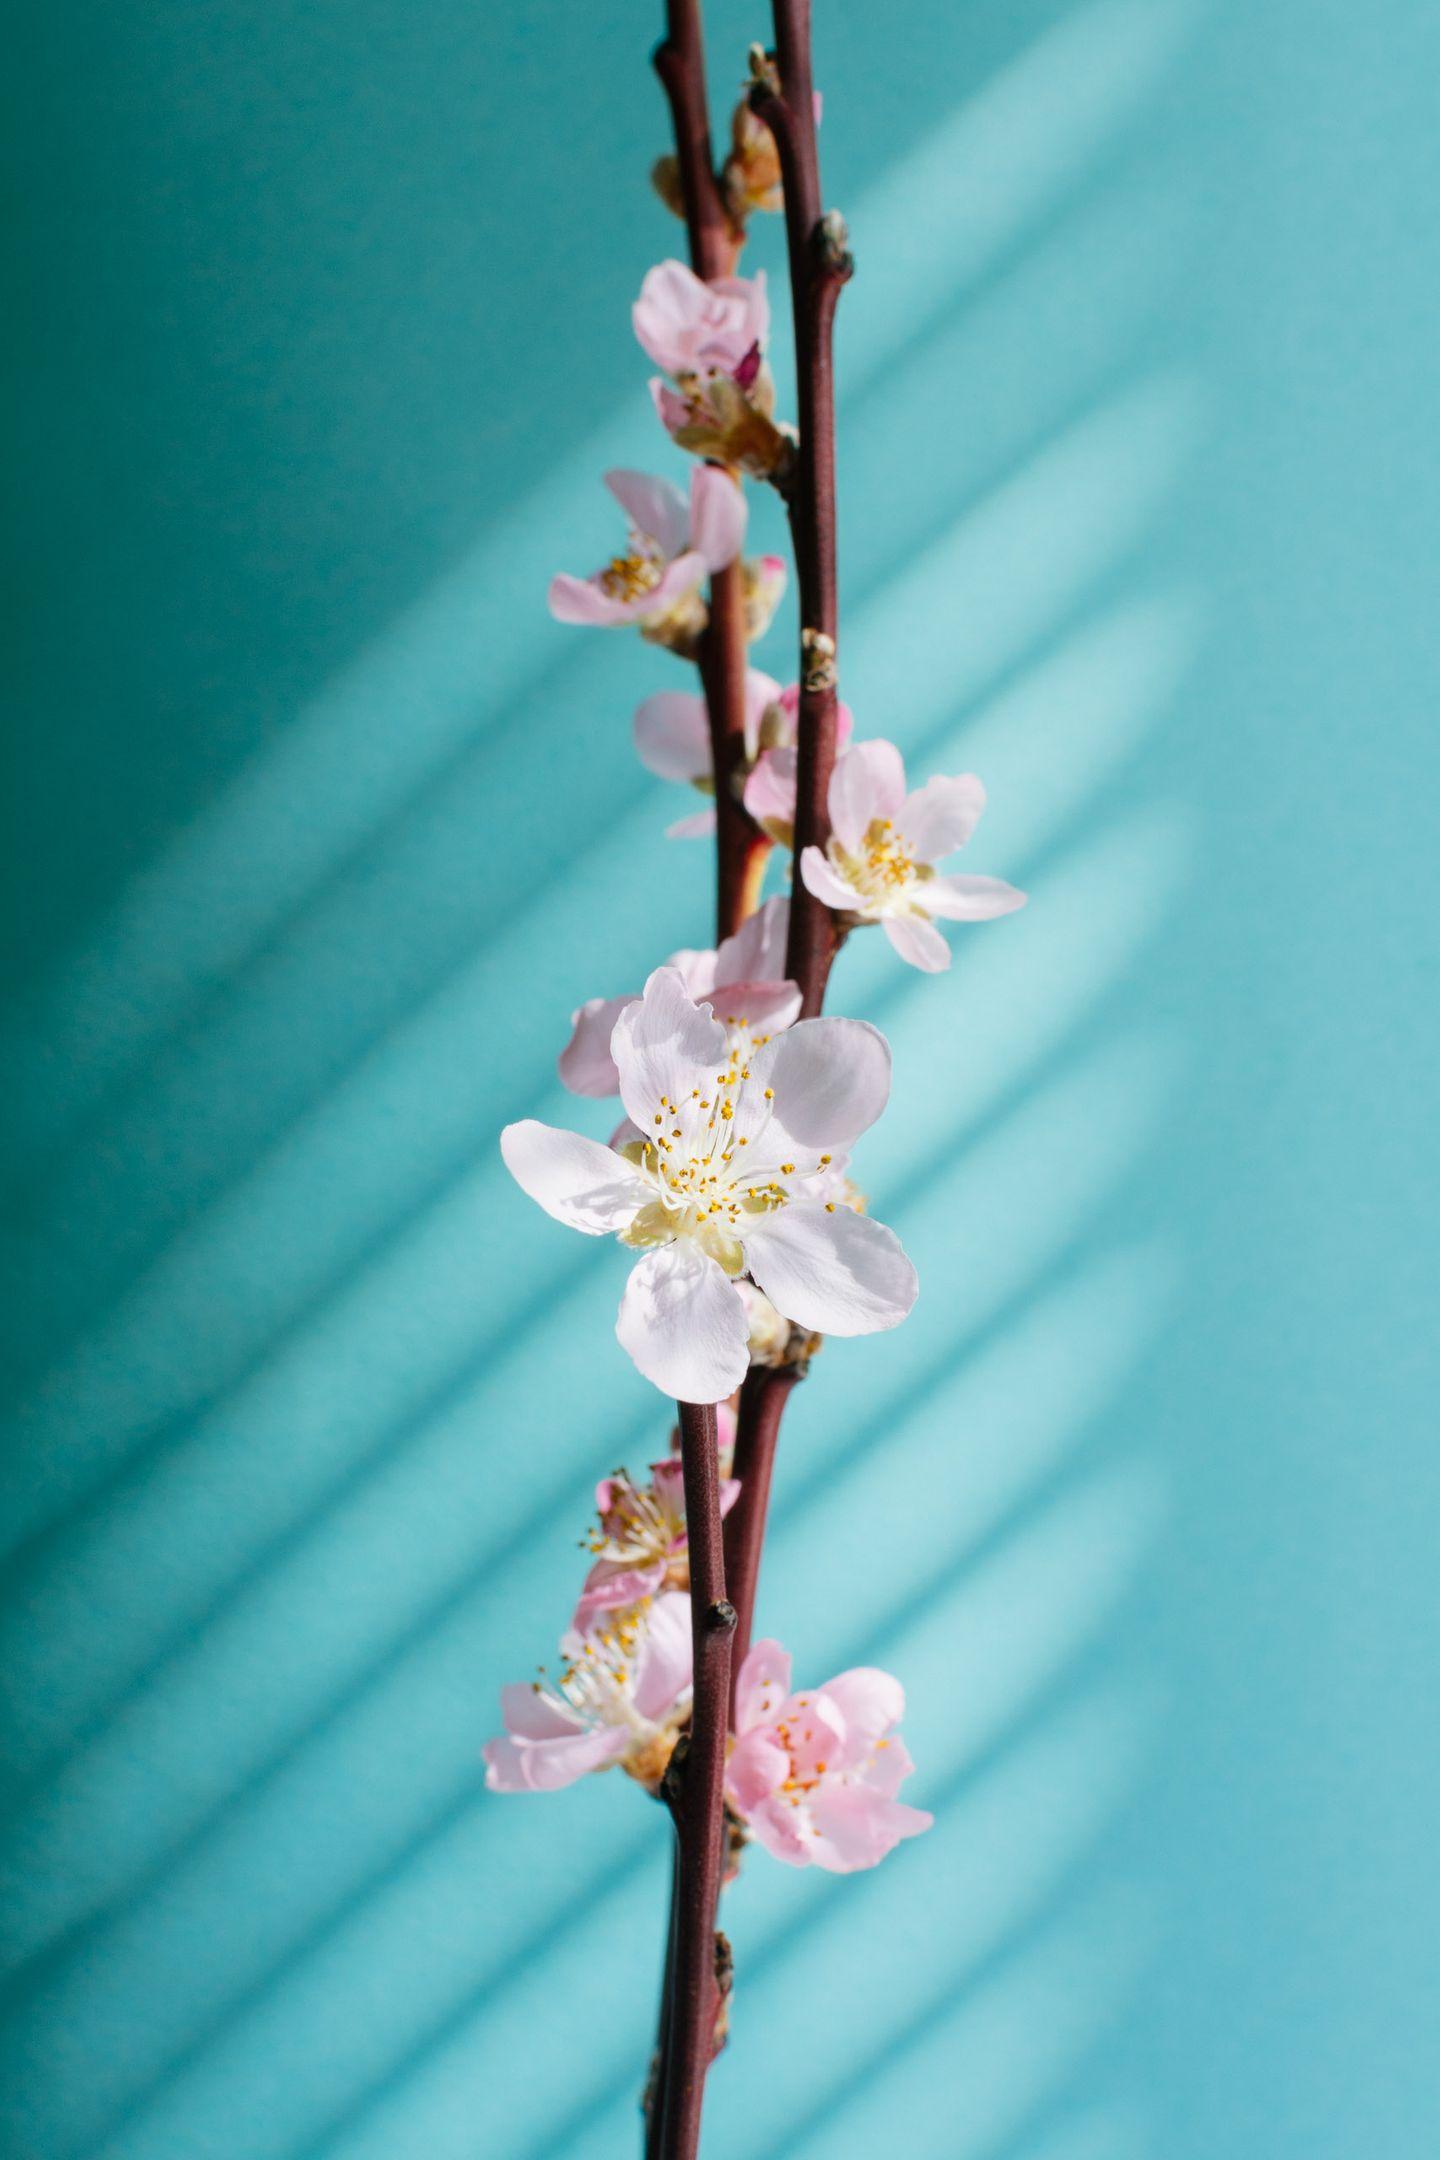 Peach flowering branch